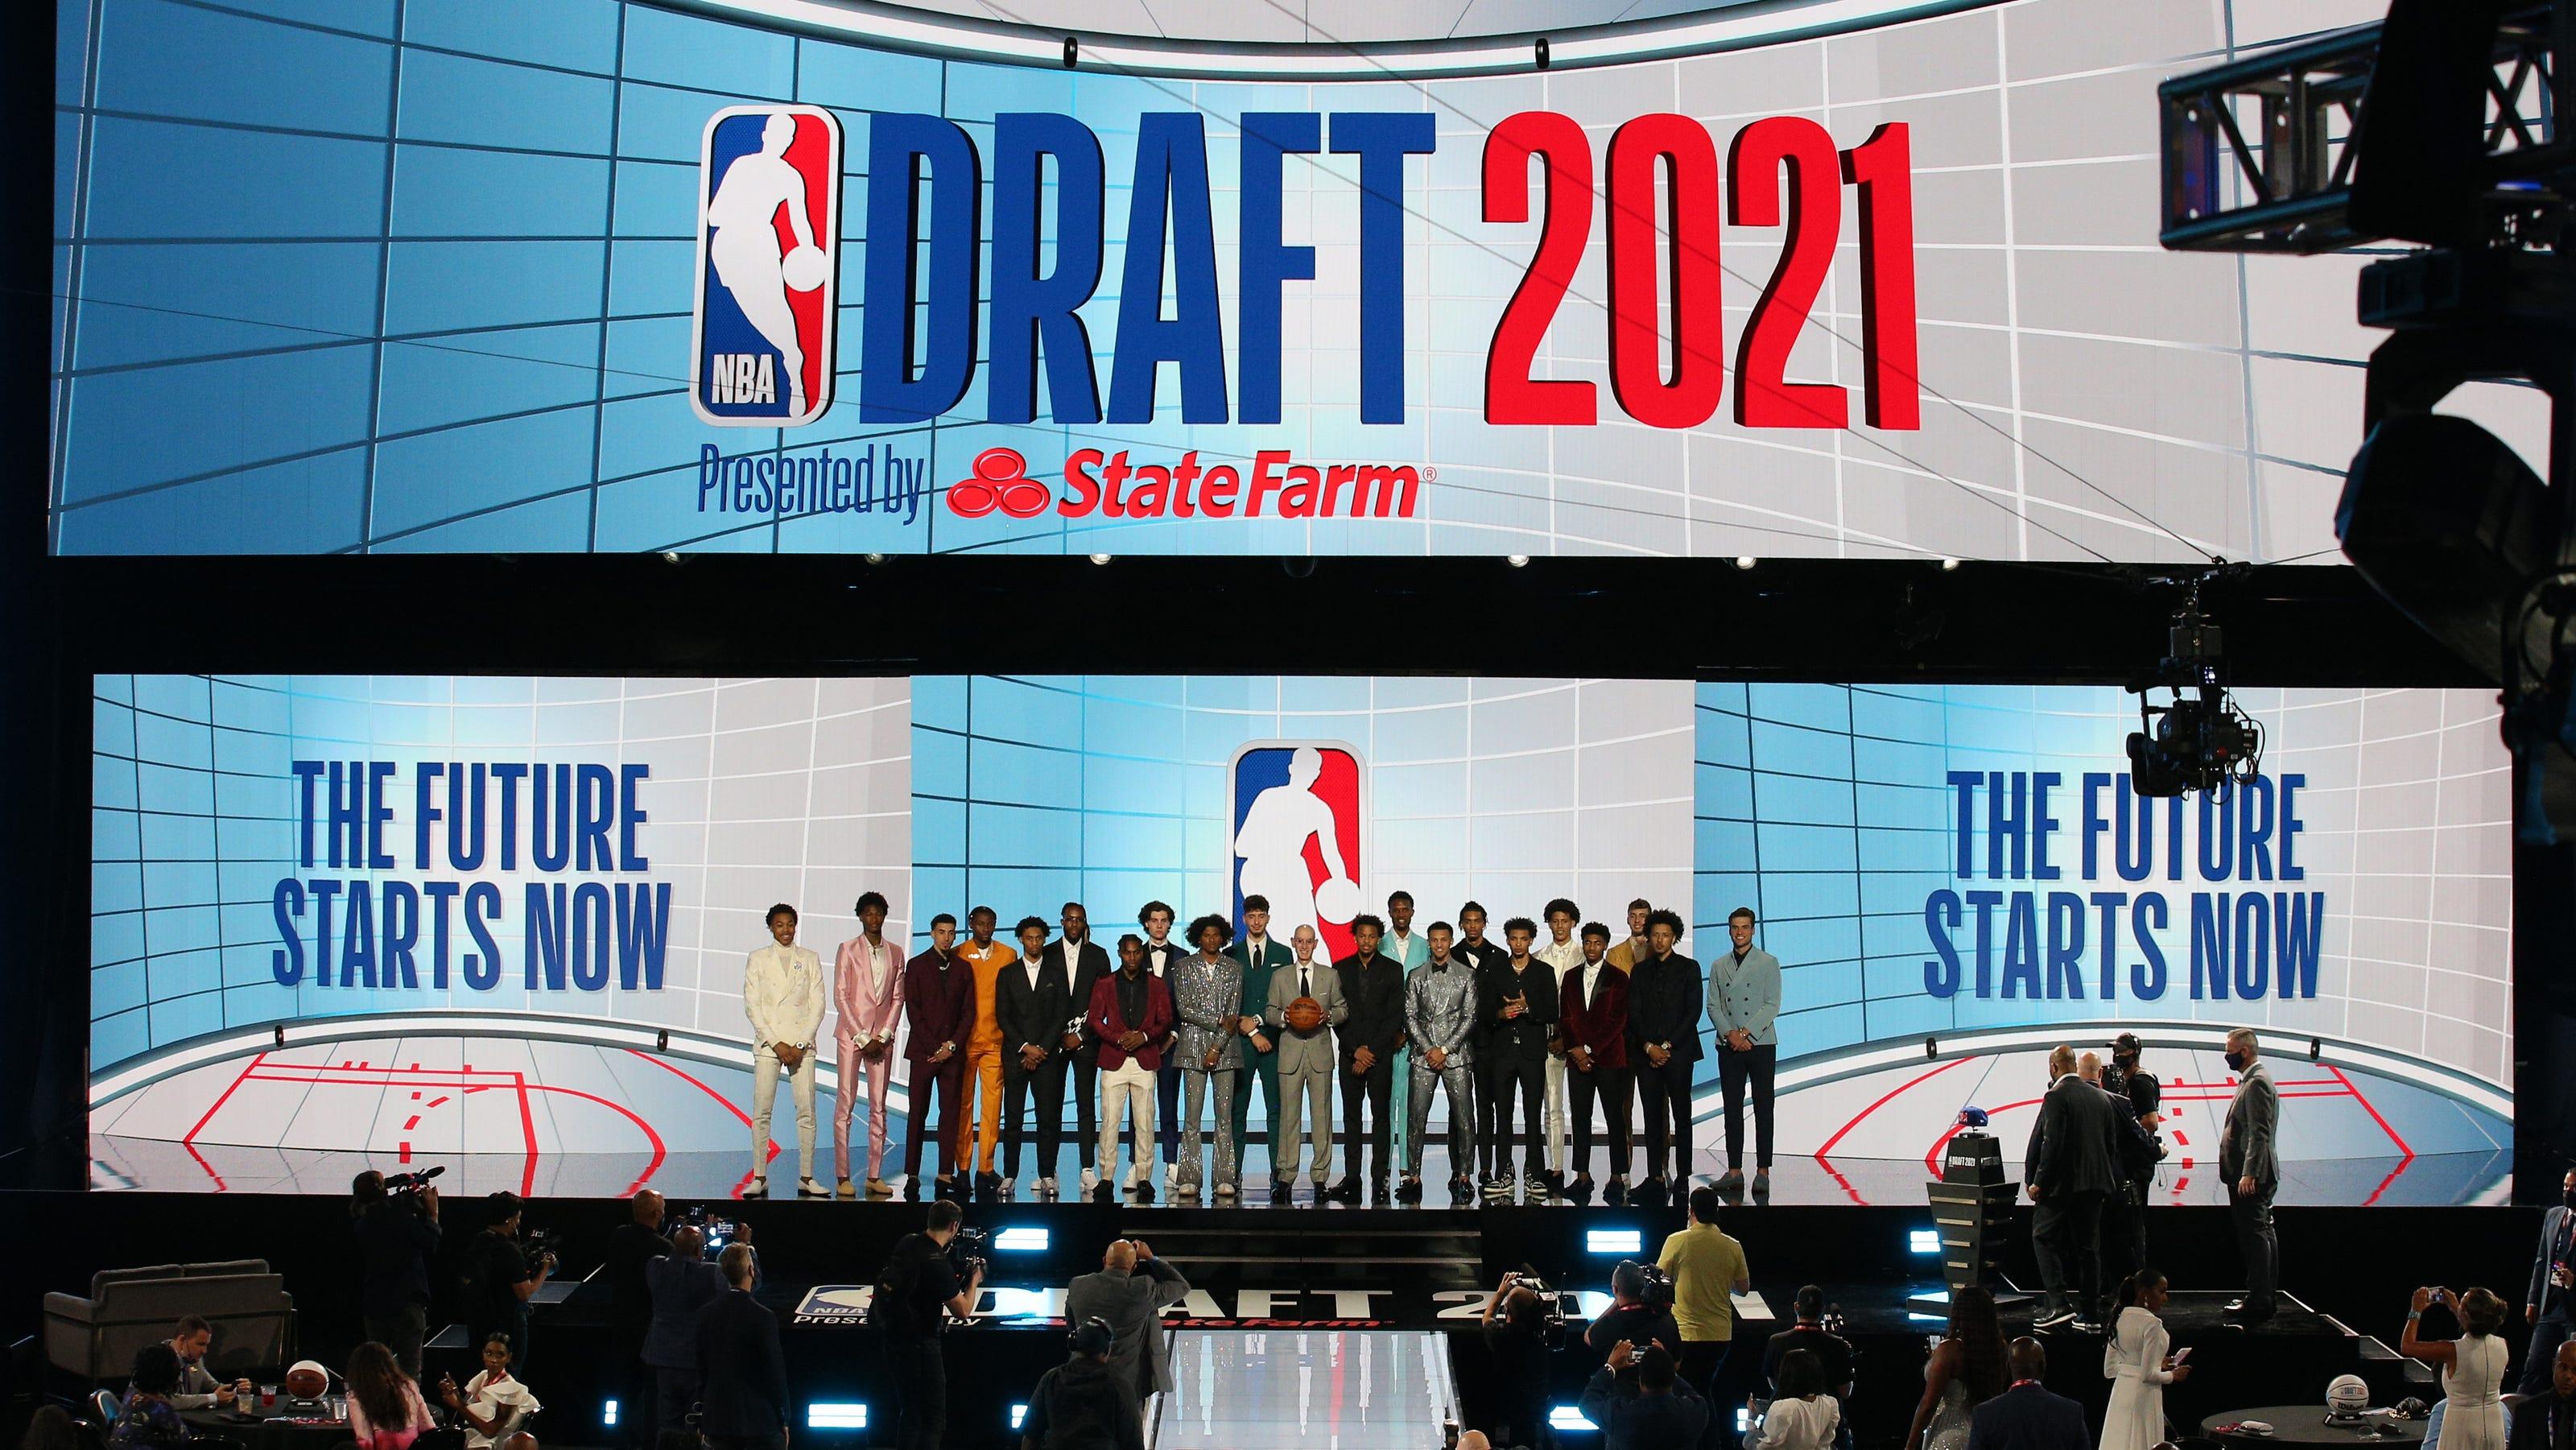 драфт НБА, Оклахома-Сити, Торонто, Орландо, Голден Стэйт, Сан-Антонио, Сакраменто, Джош Гидди, Джейлен Саггс, переходы